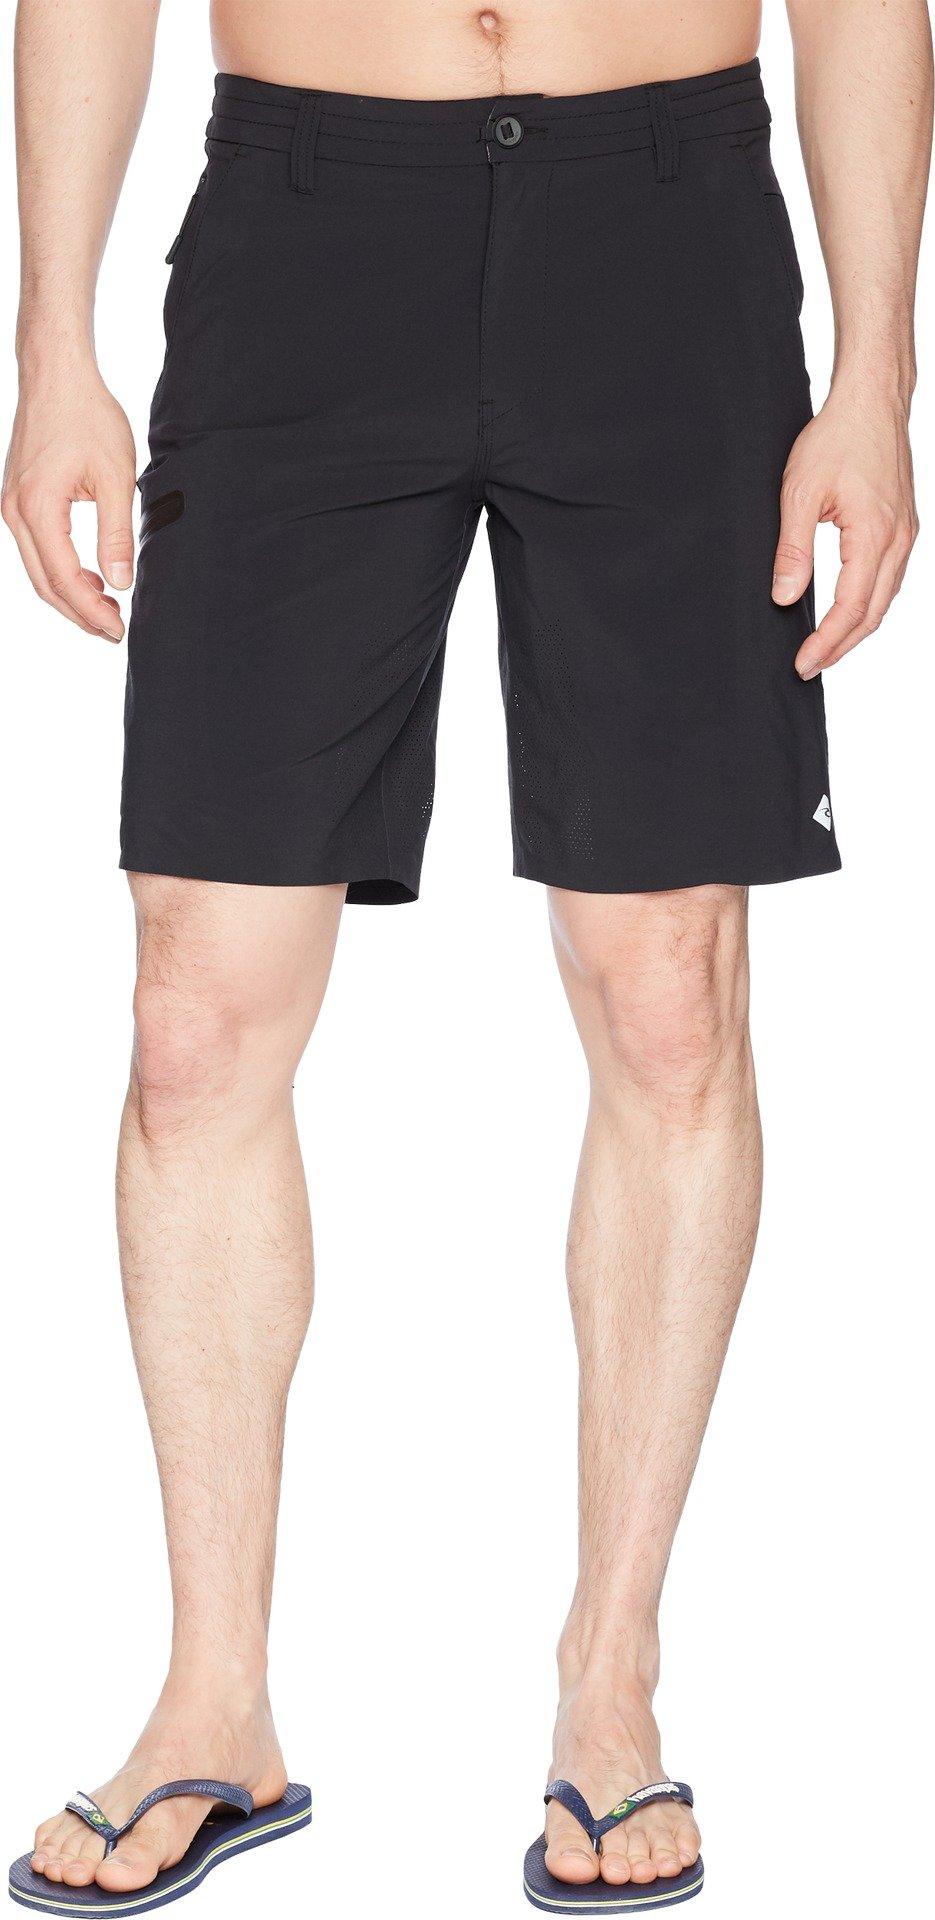 Rip Curl Men's Mf Global Entry 20'' Boardwalk Hybrid Travel Stretch Shorts, Black/Black, 36